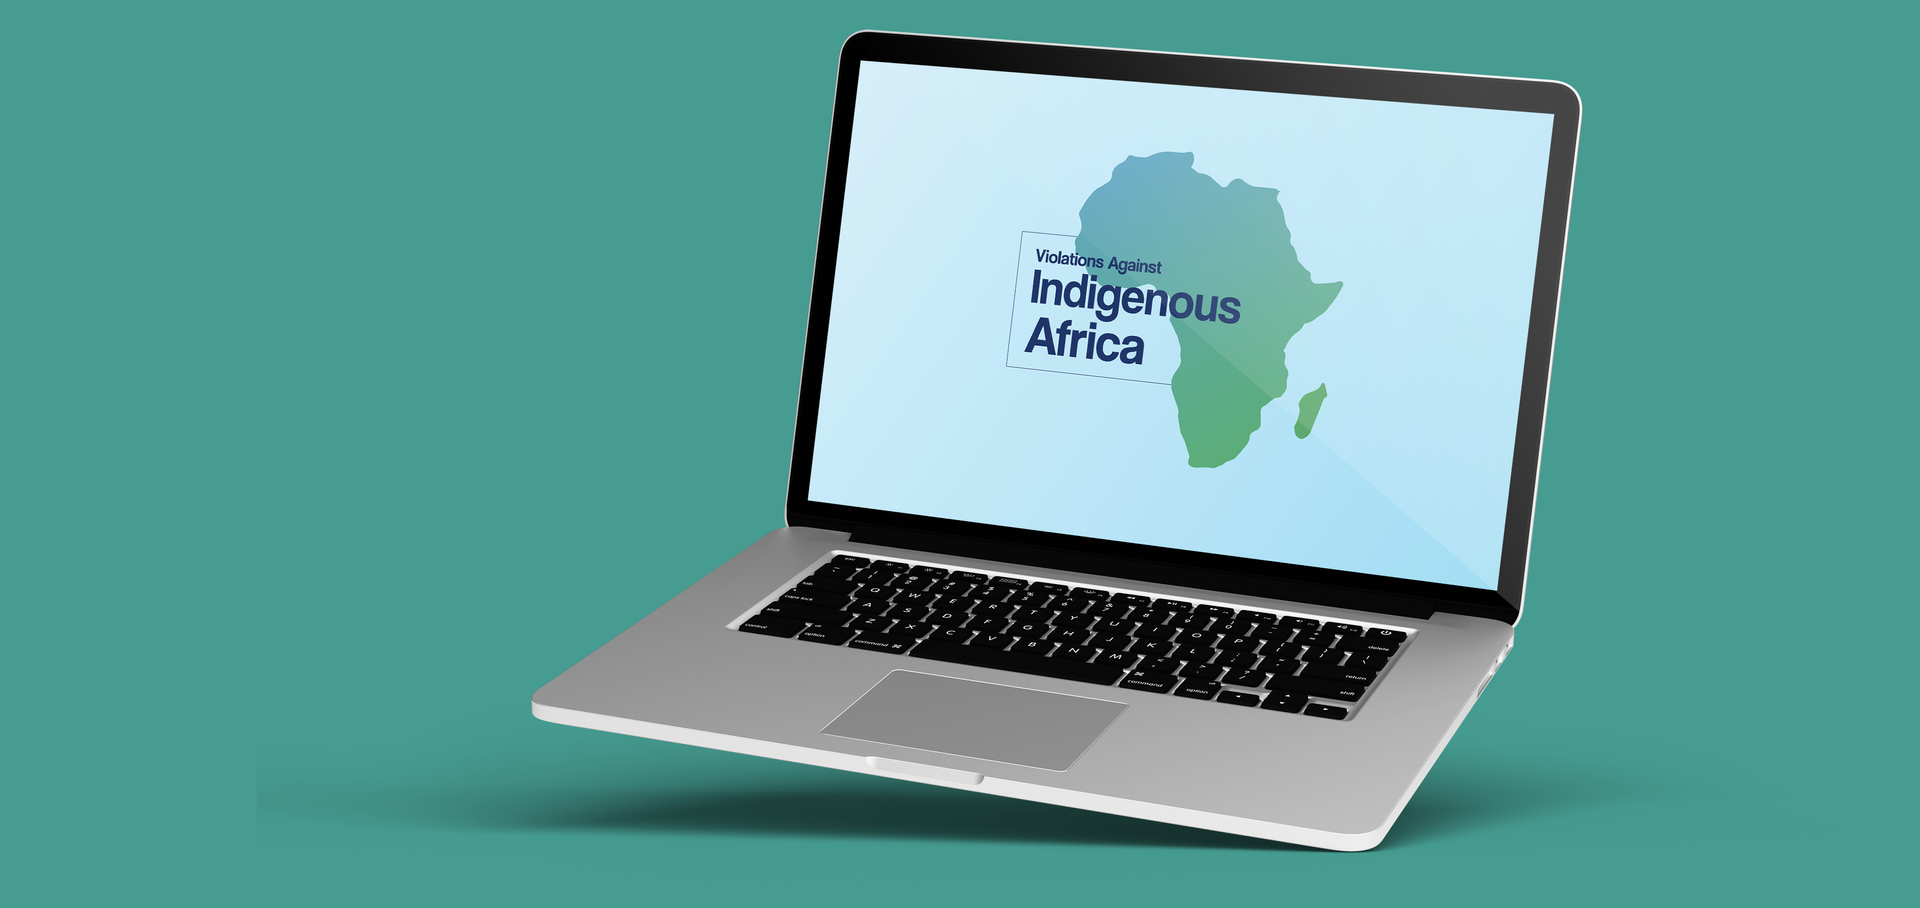 Violations Against Indigenous Africa